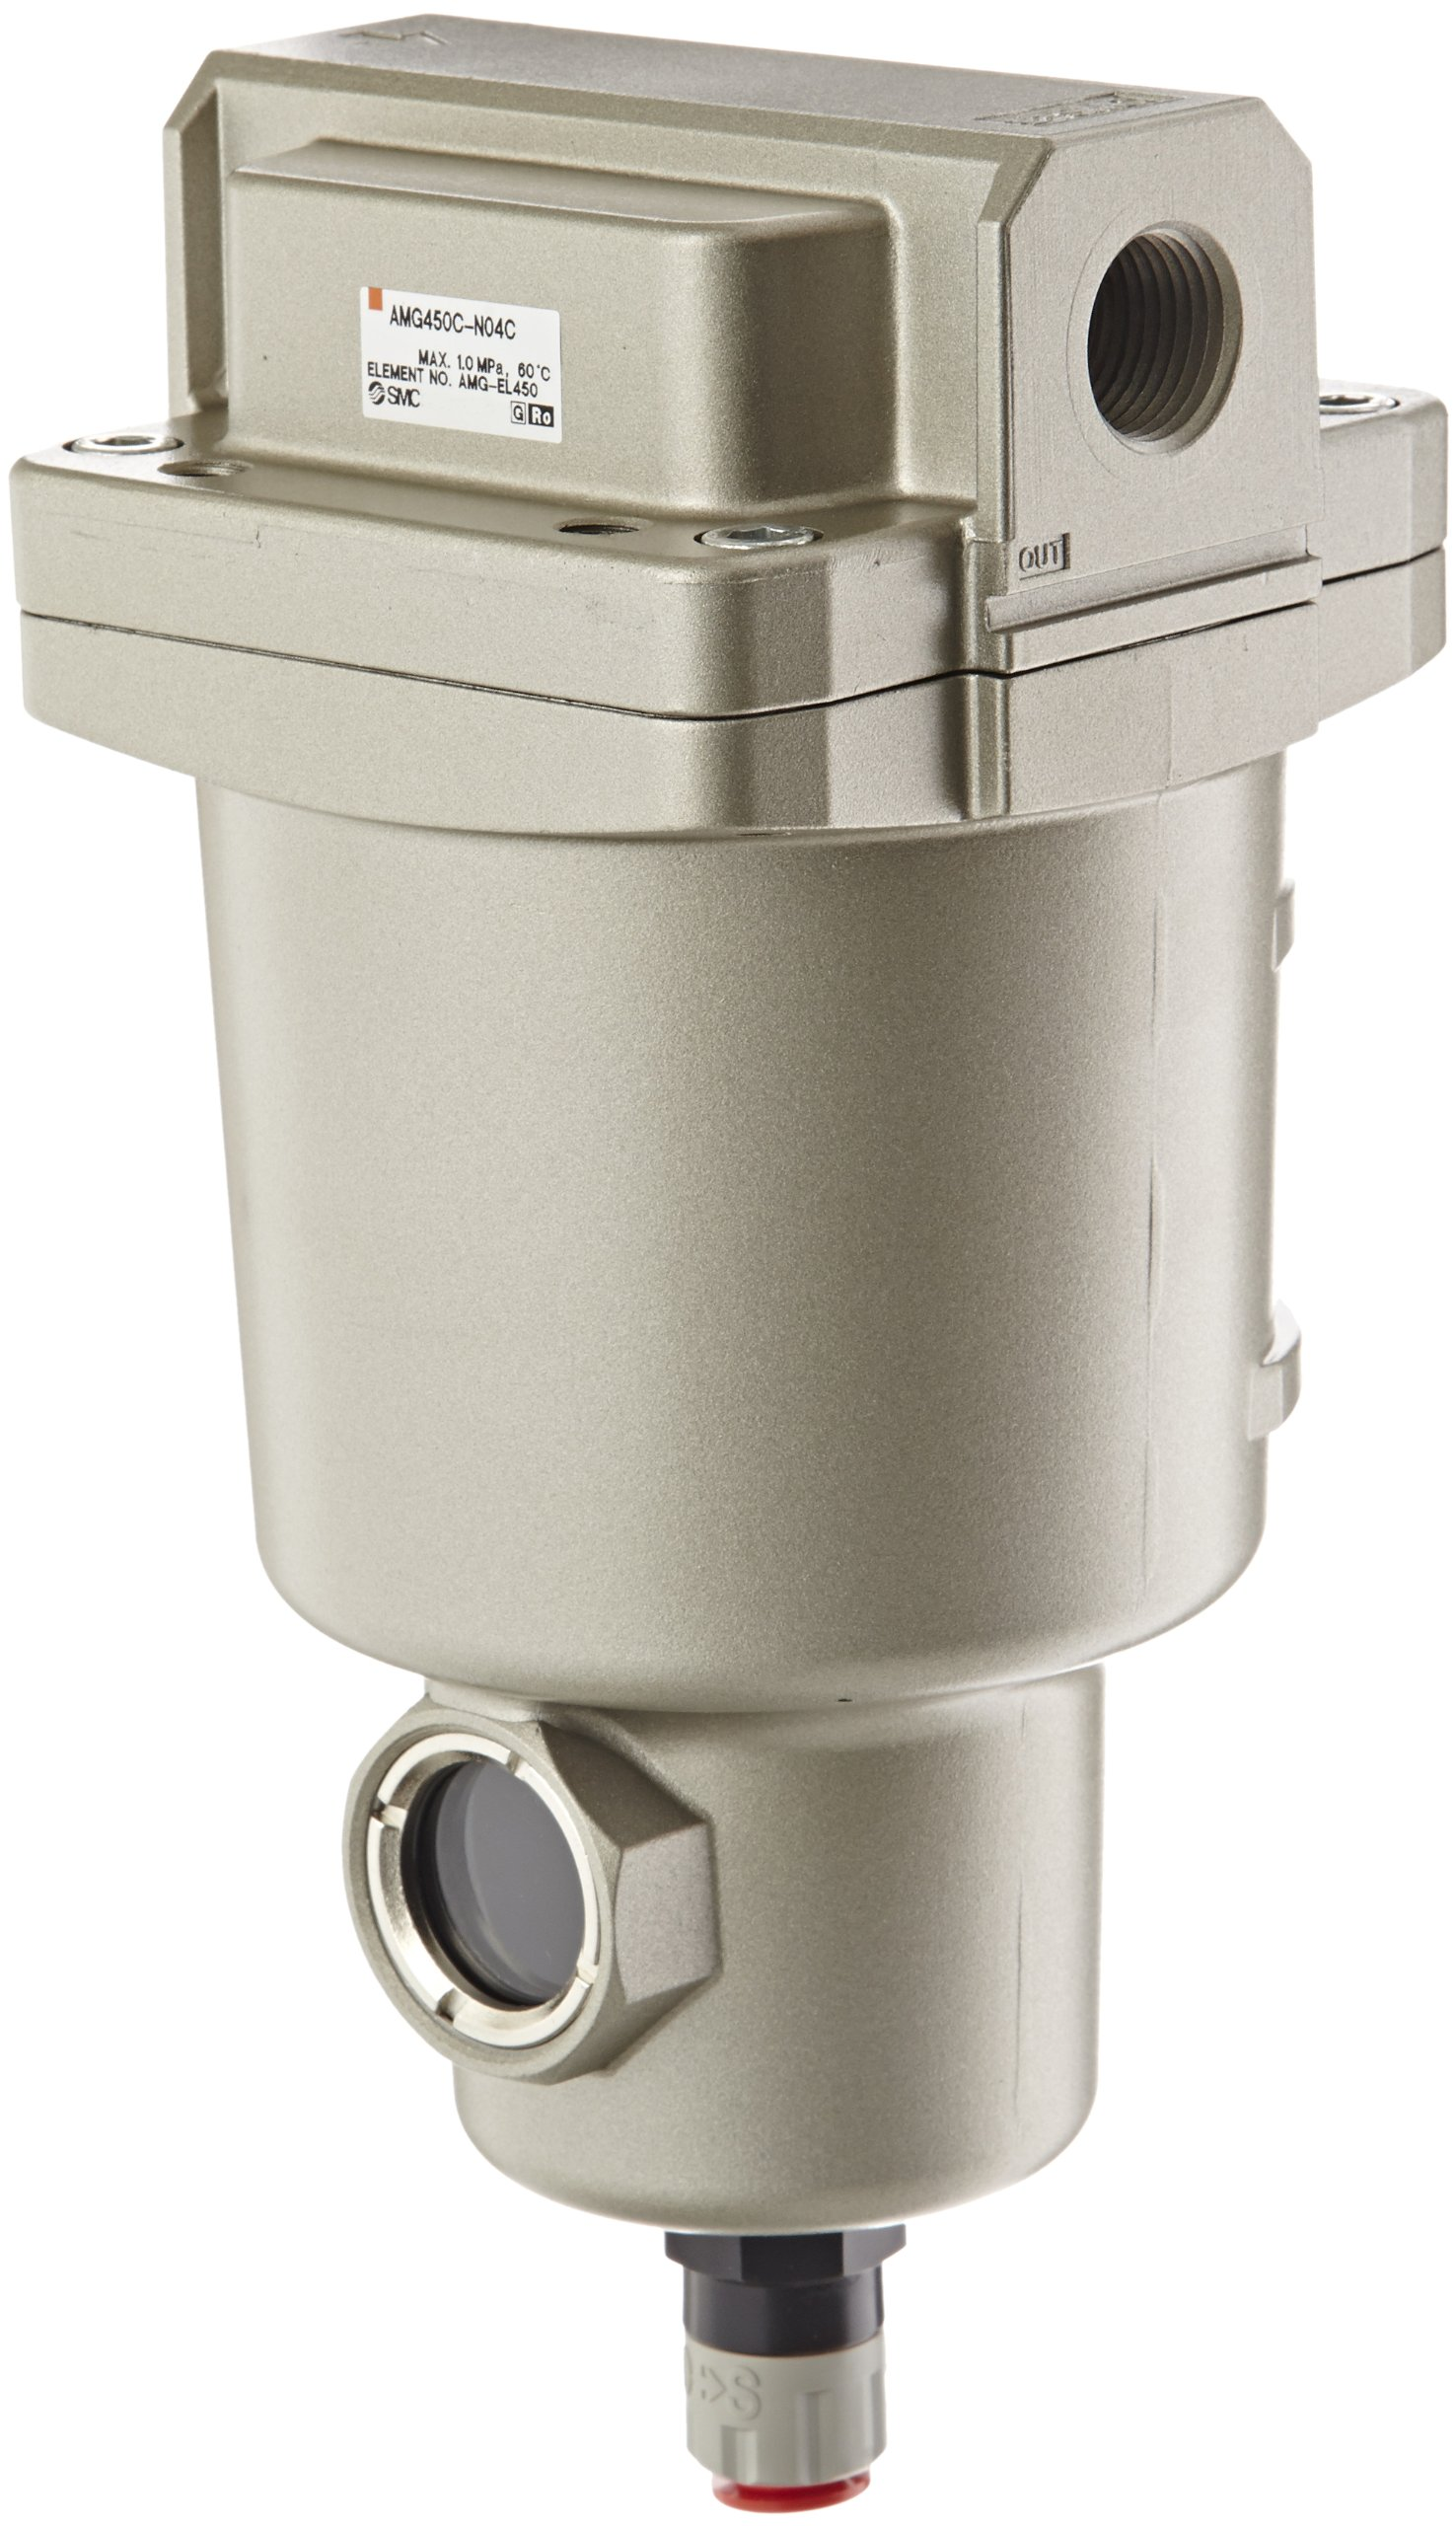 SMC AMG450C-N04C Water Separator, N.C. Auto Drain, 2,200 L/min, 1/2'' NPT